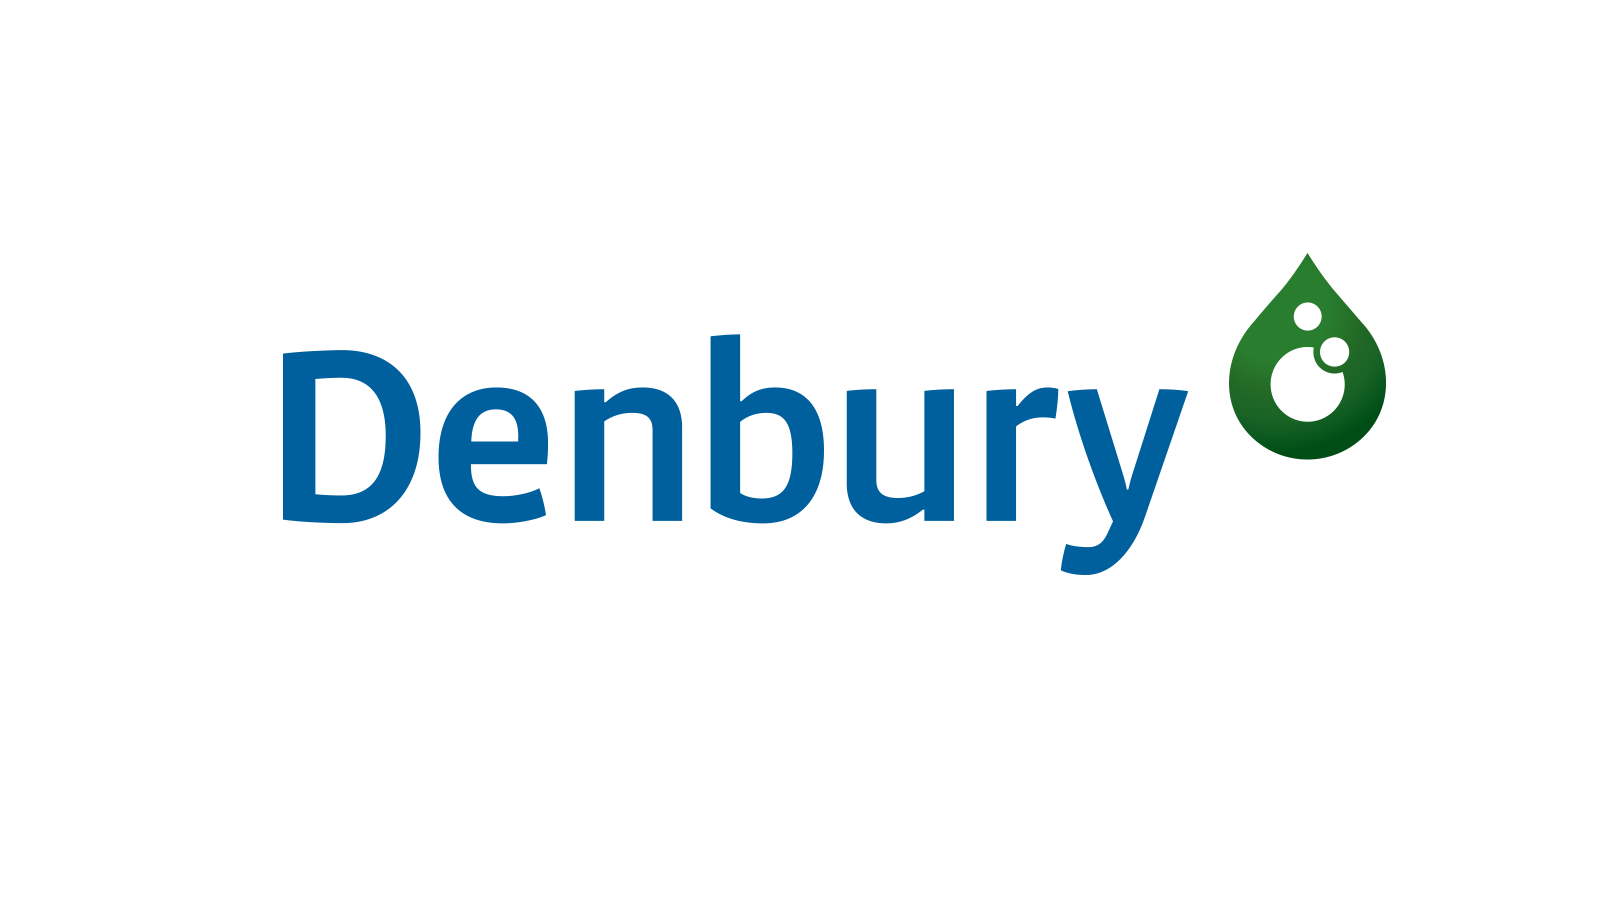 denbury.png